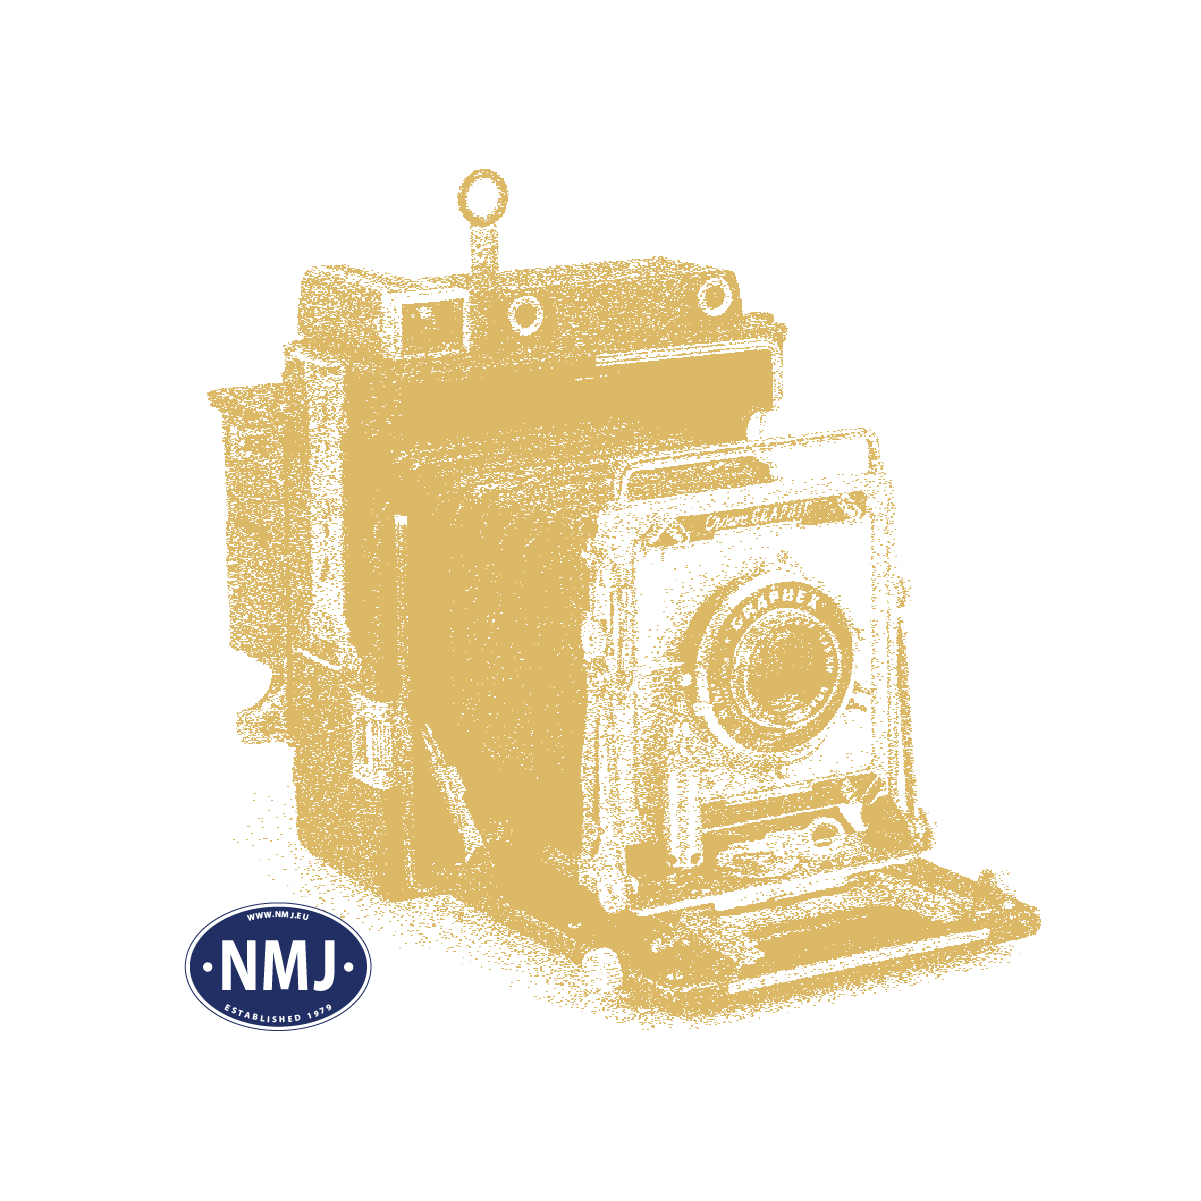 NMJT93001 - NMJ Topline SJ Y1 1309, Orange, DCC m/ Sound